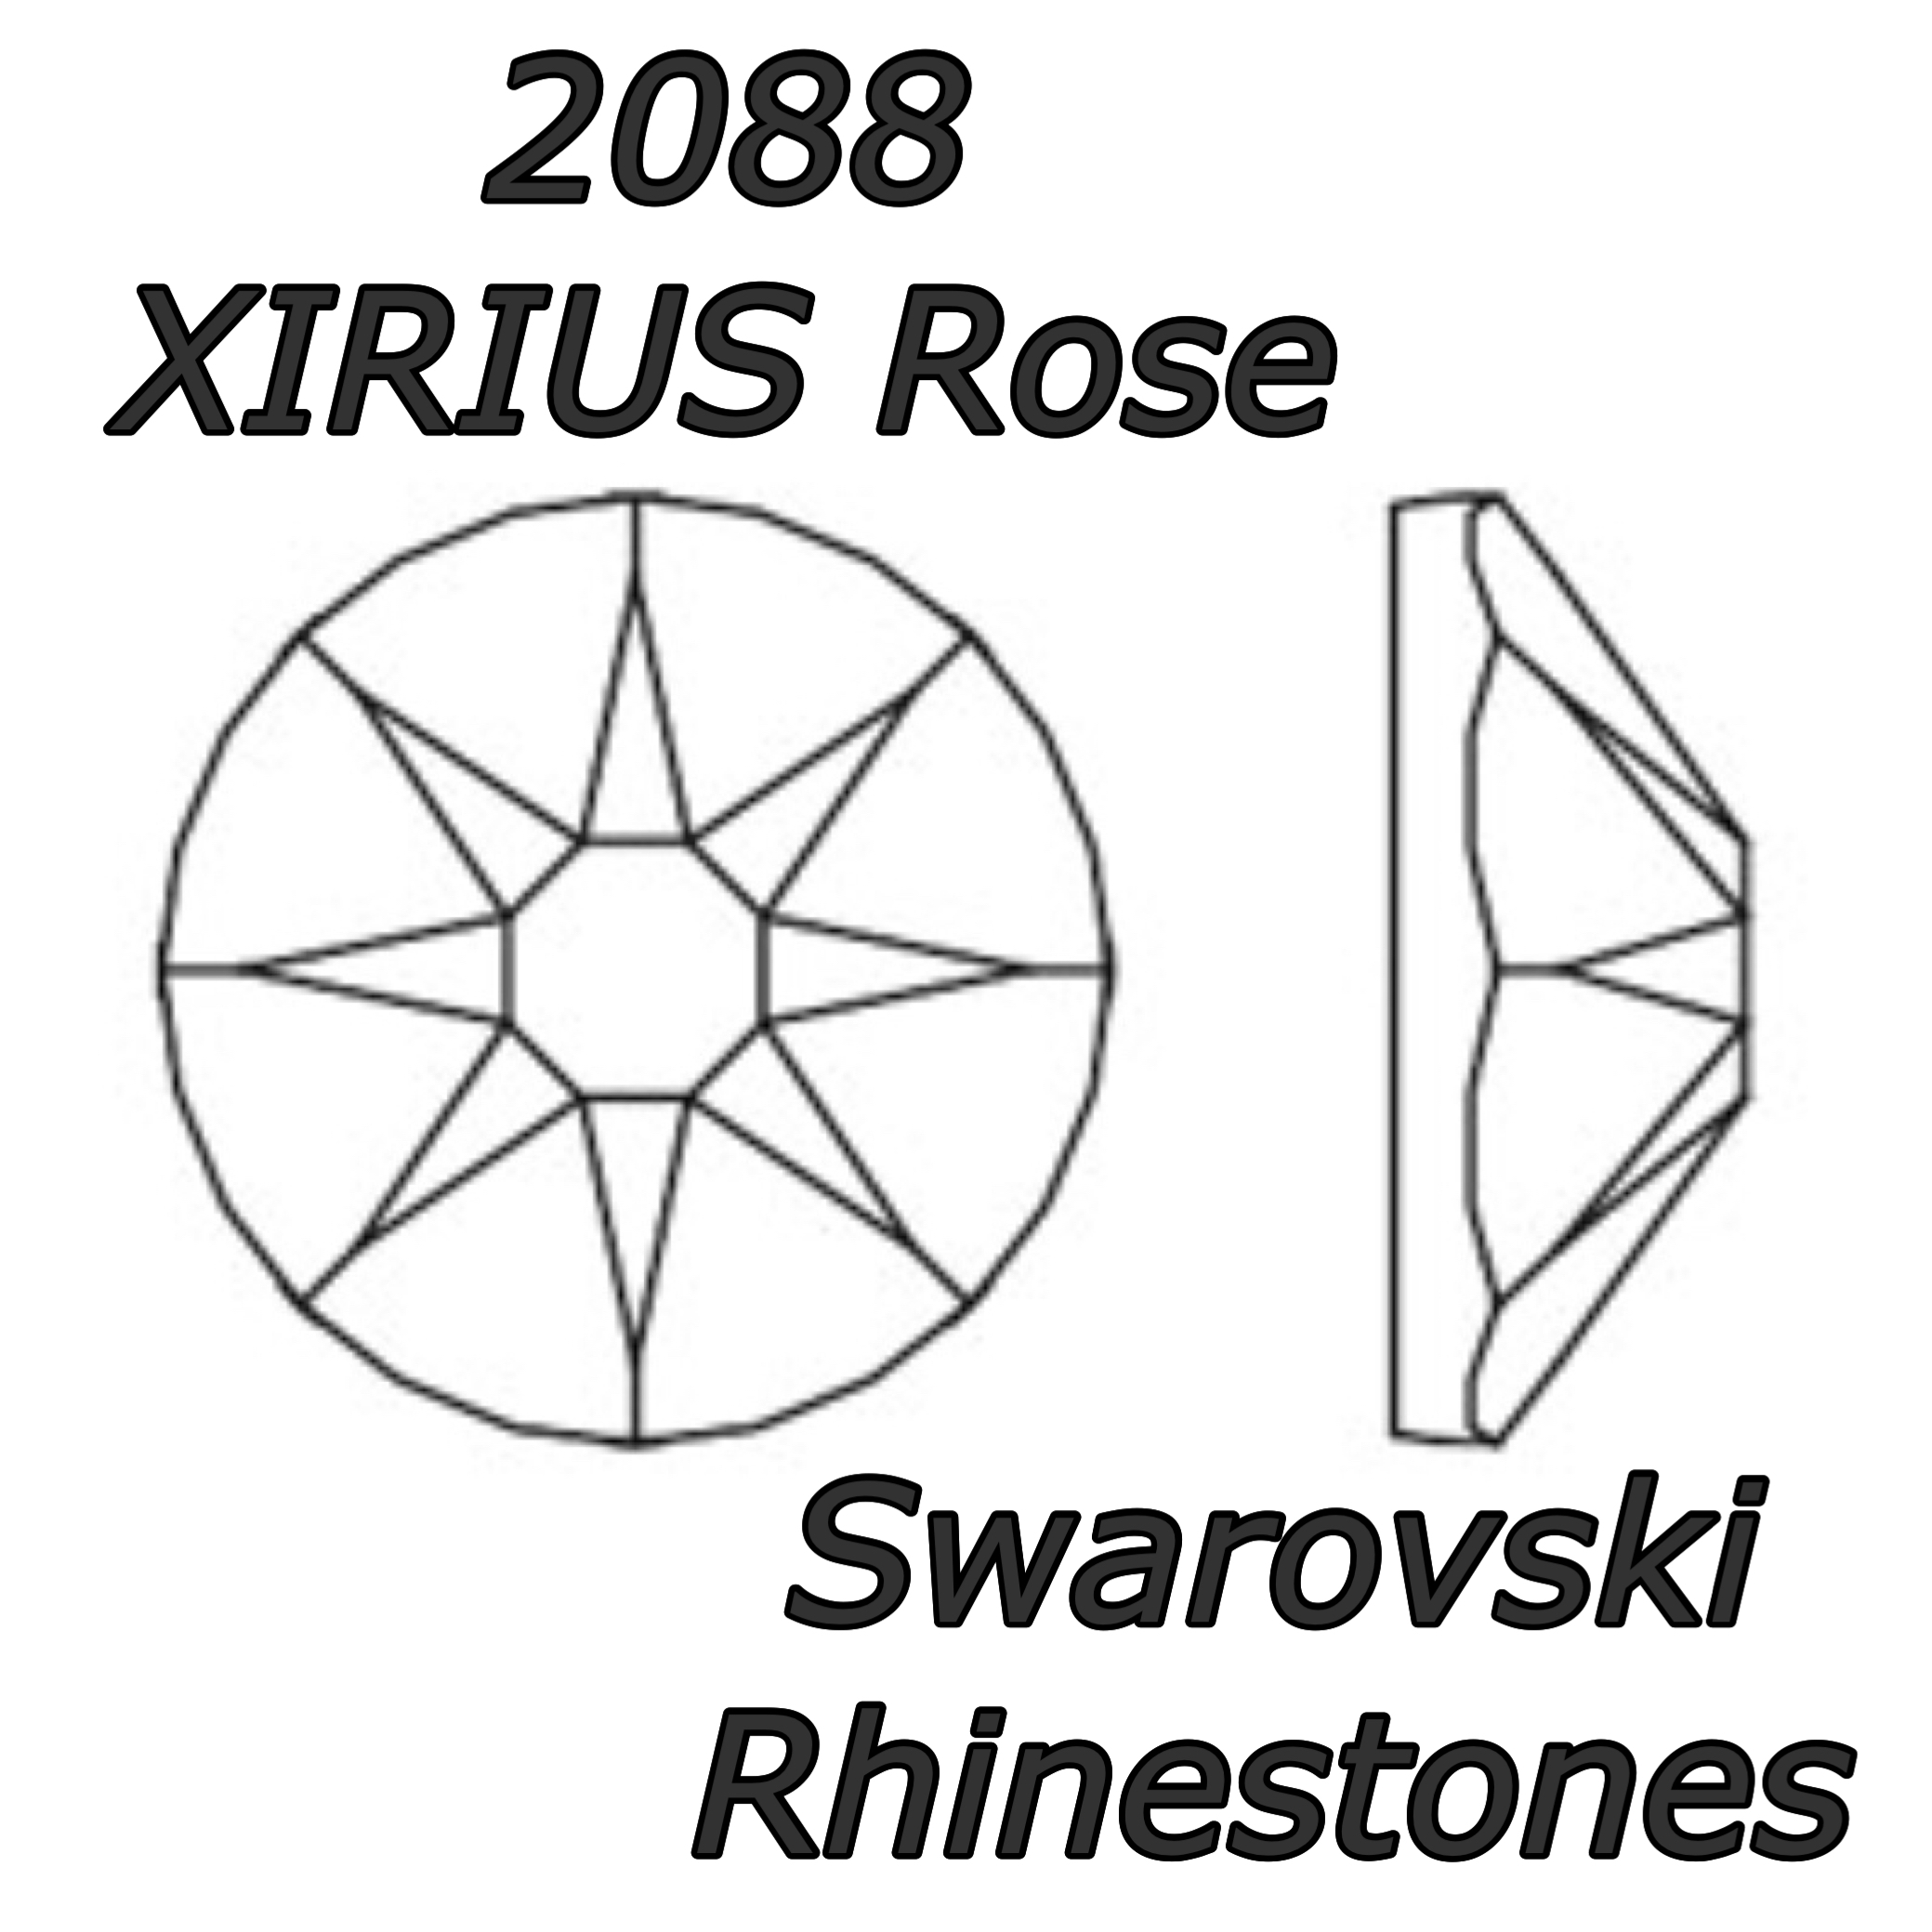 2088 Rhinestones